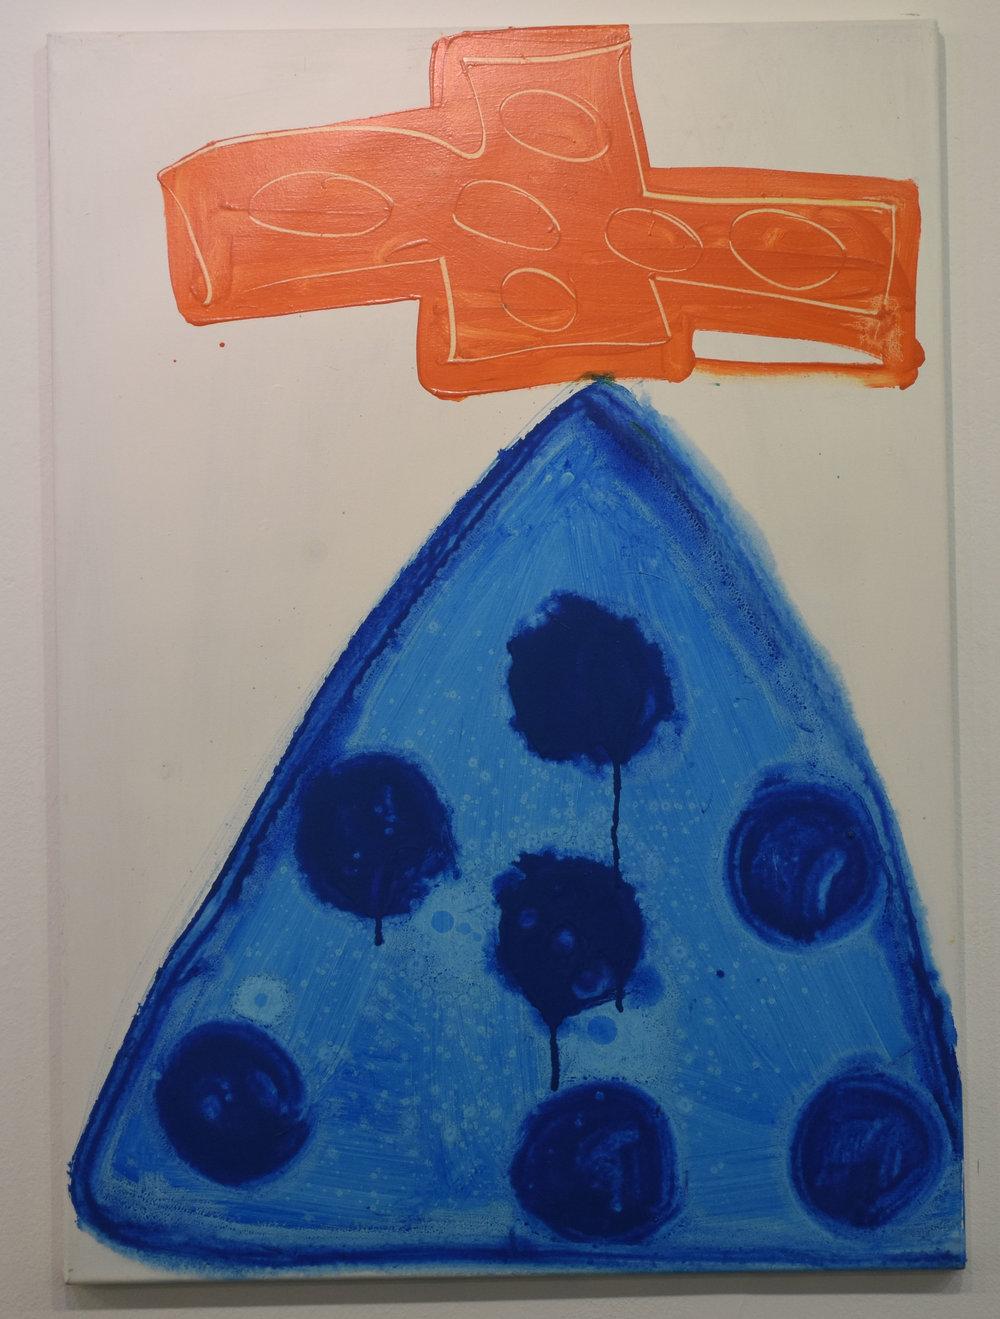 10 'Orange and Blue' .JPG